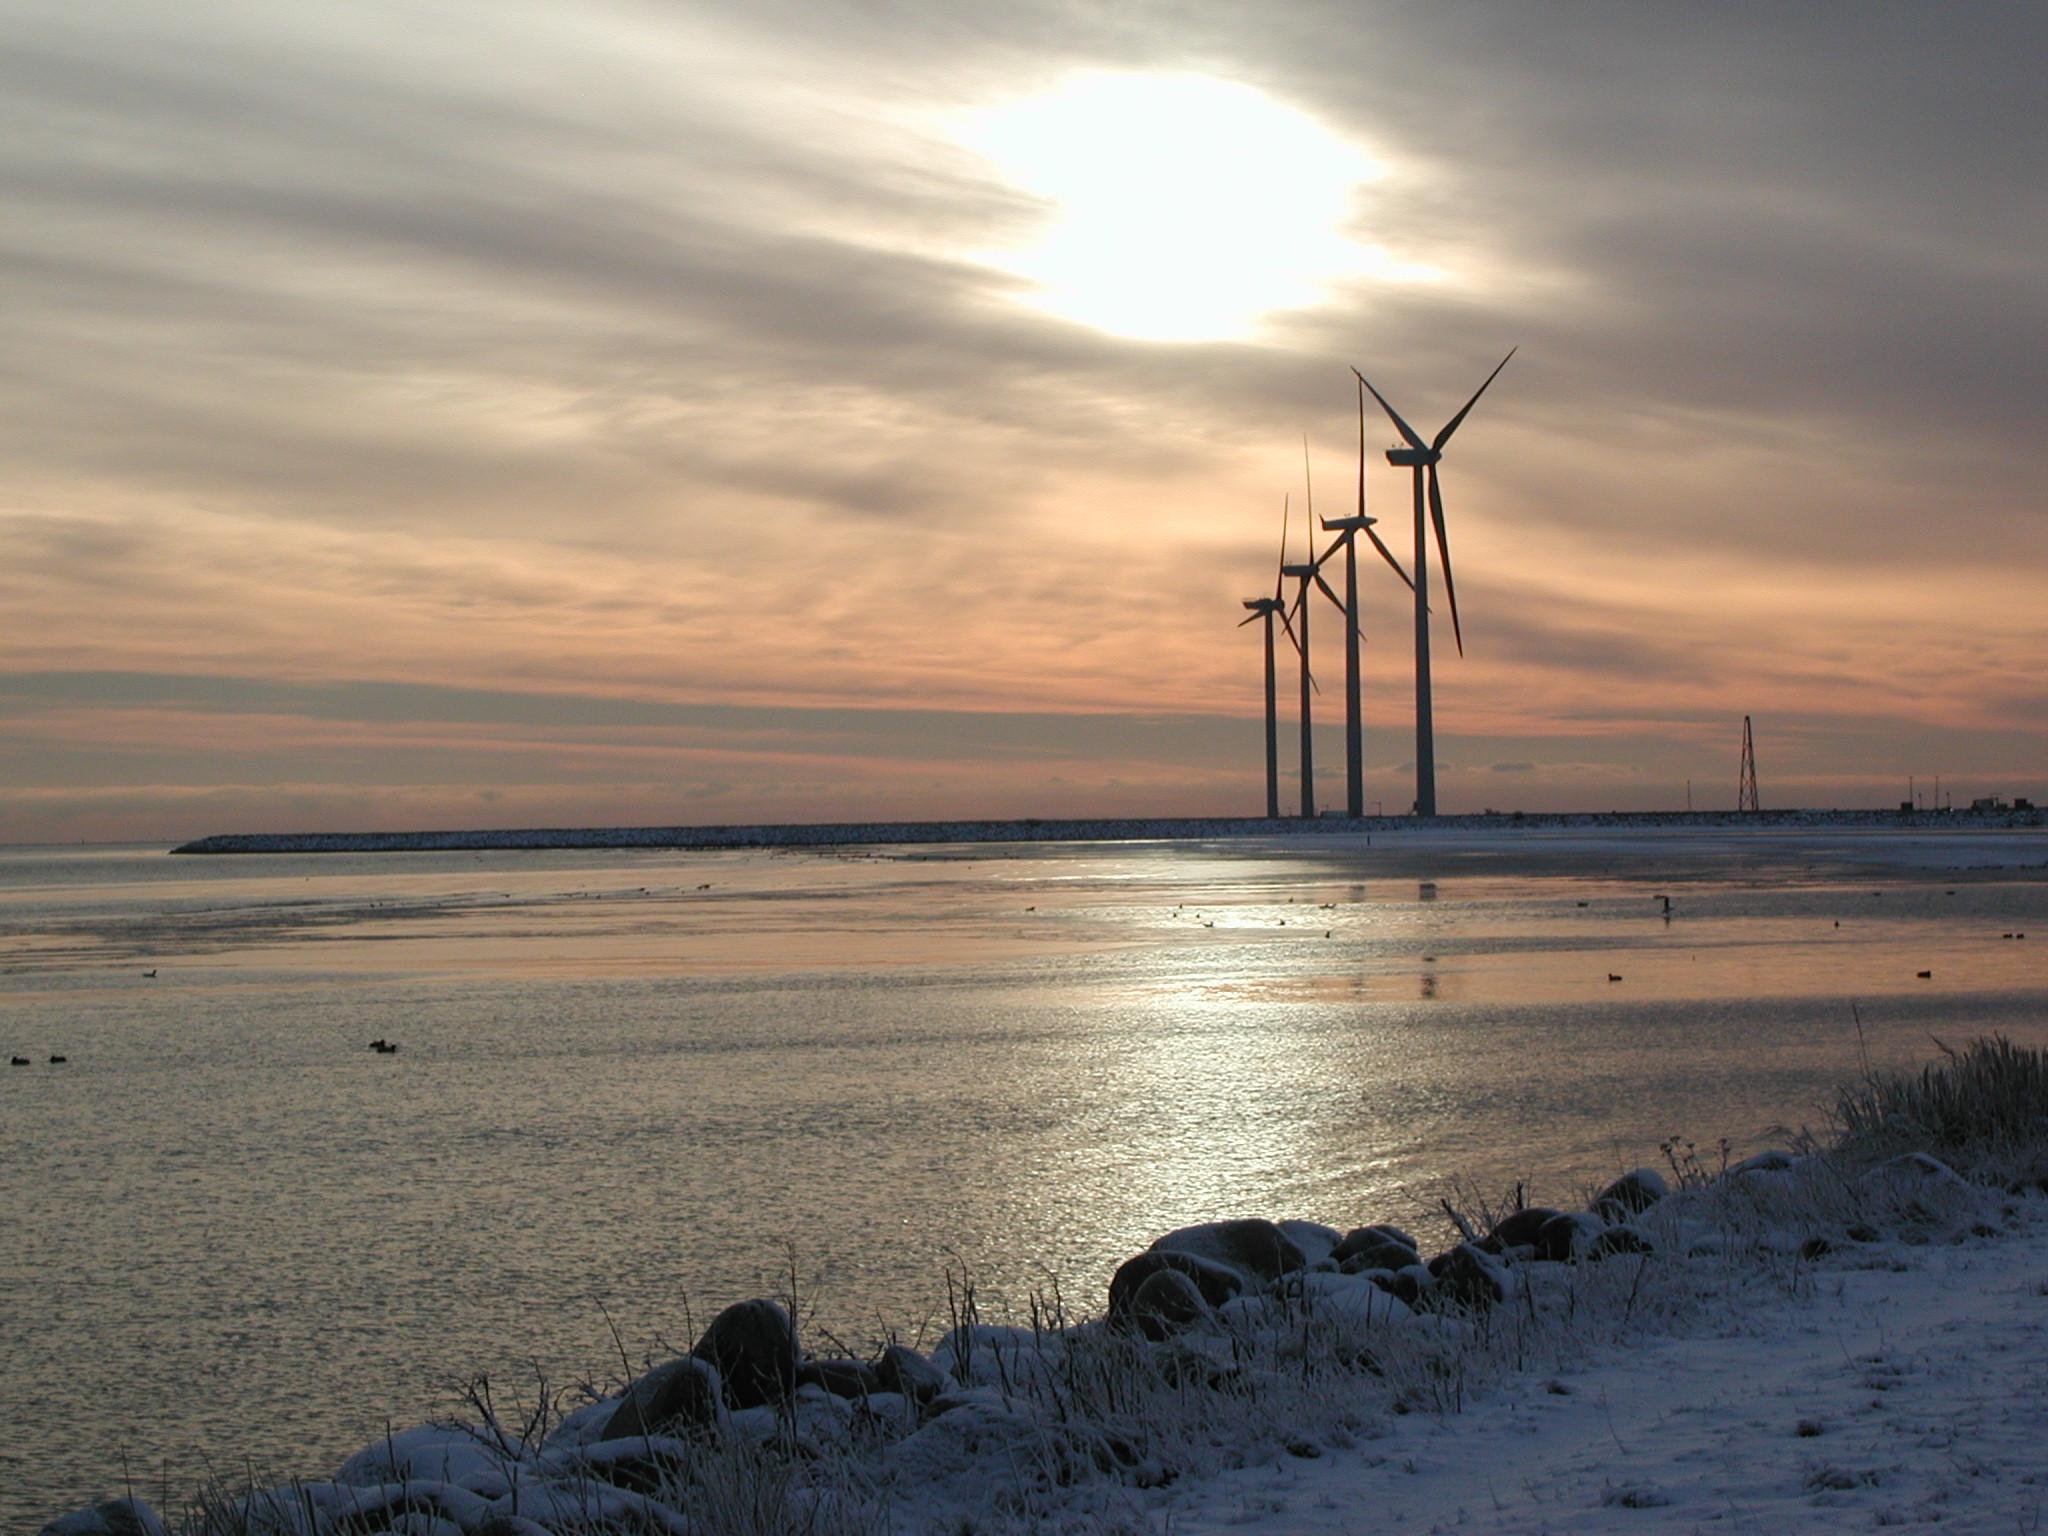 Wind energy Good or bad